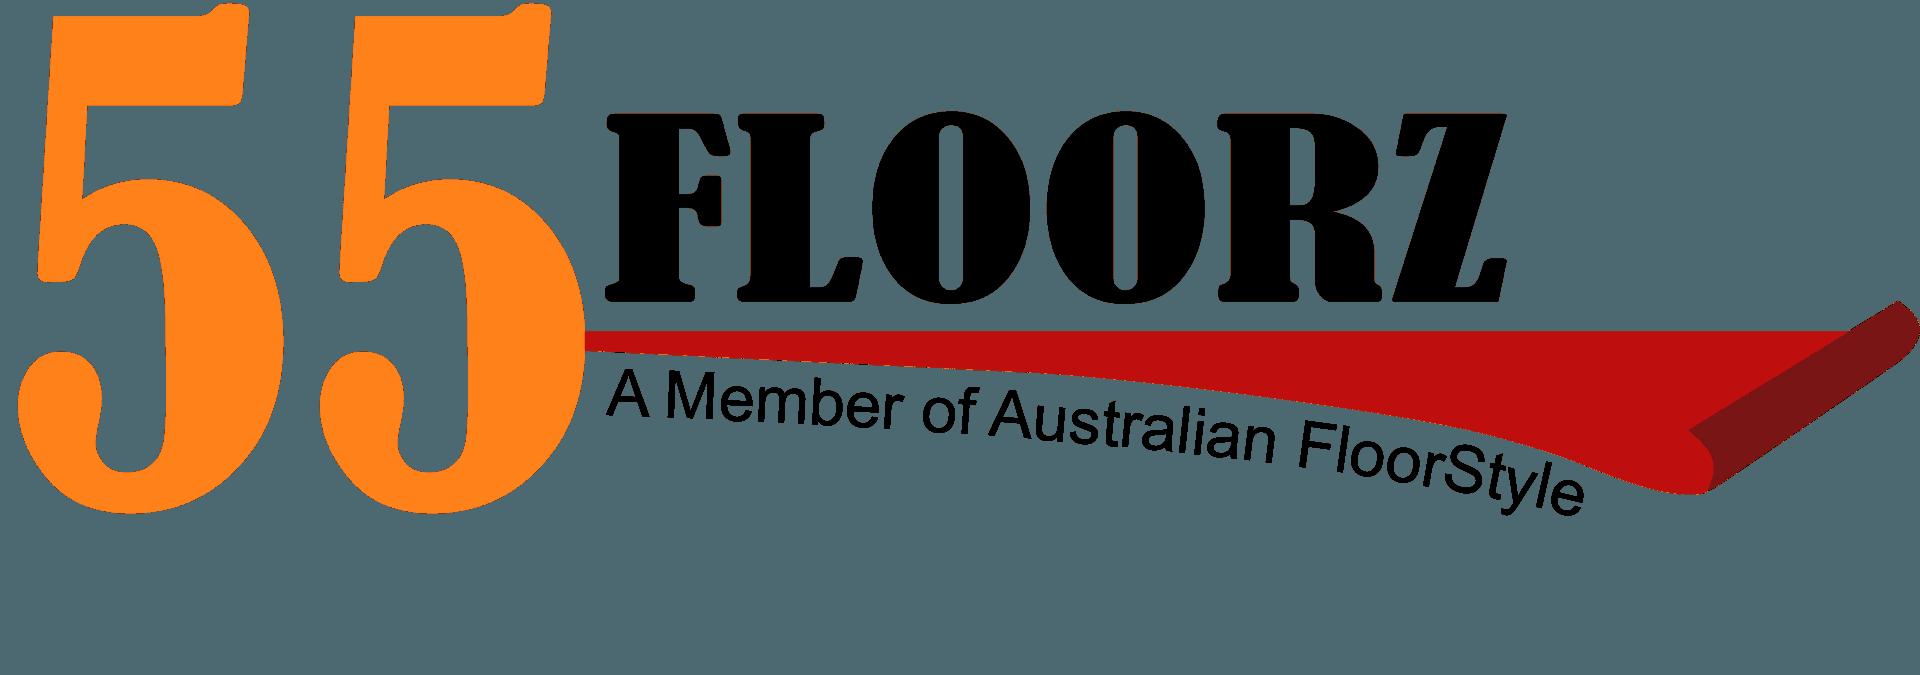 55 Floorz Carpet Installations Gold Coast Logo